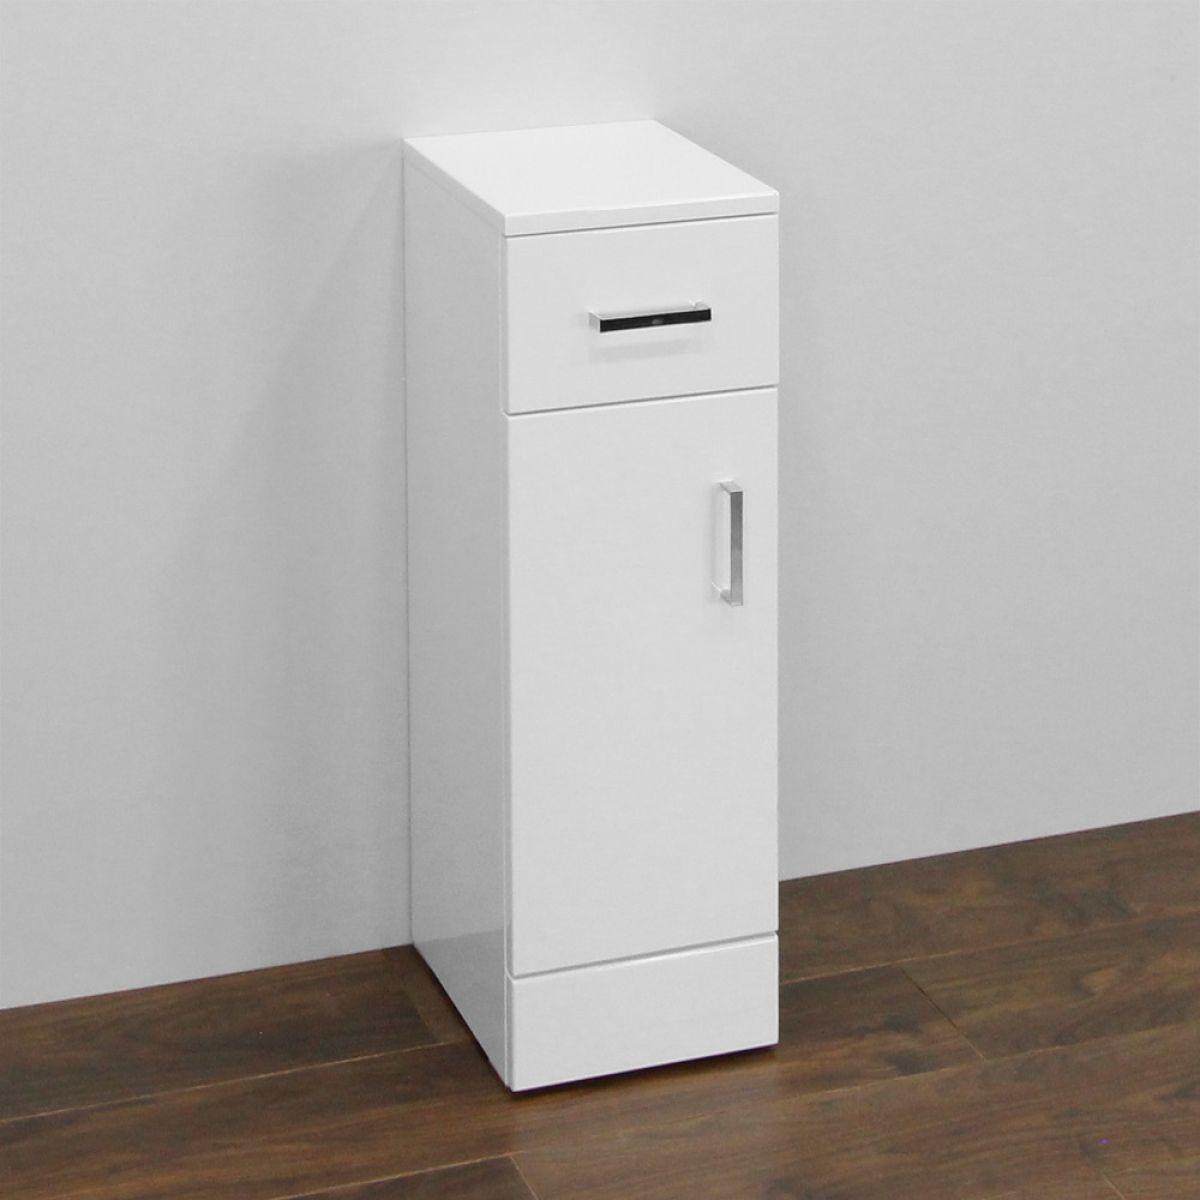 Premier High Gloss White Storage Cupboard